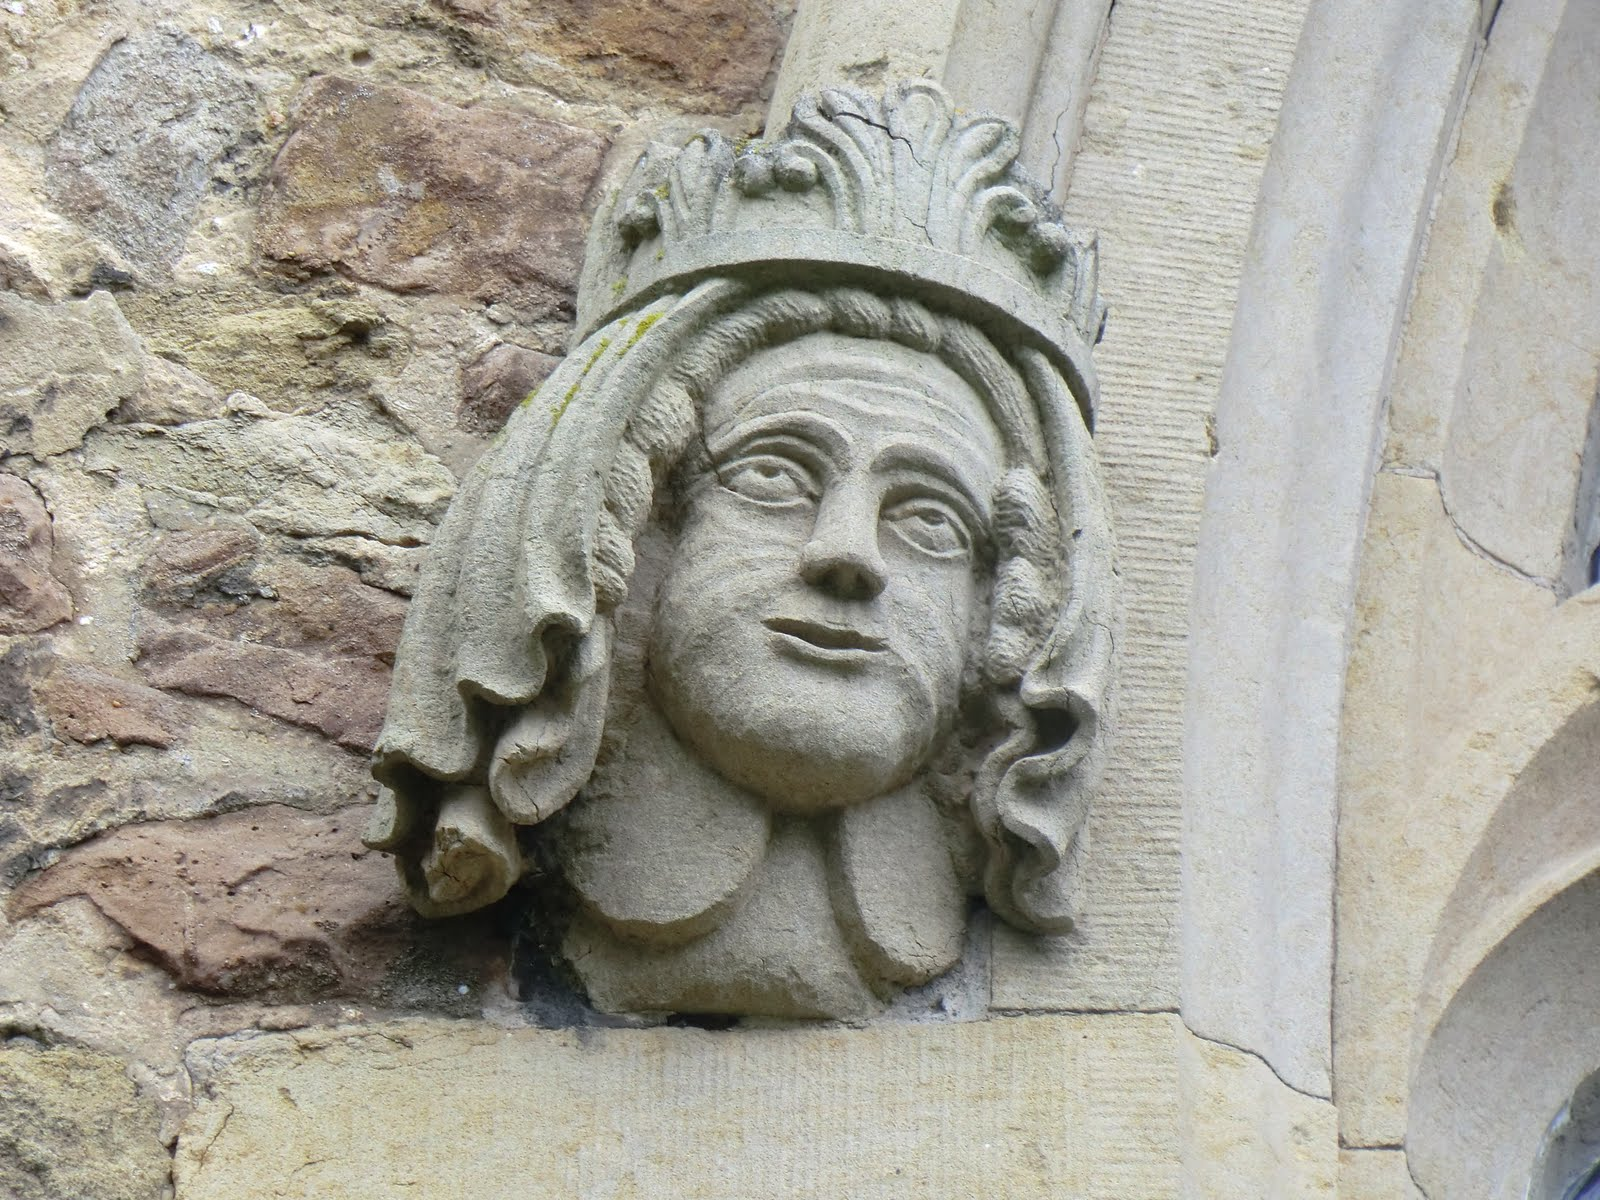 CIMG0332 Gargoyle, Westerham church